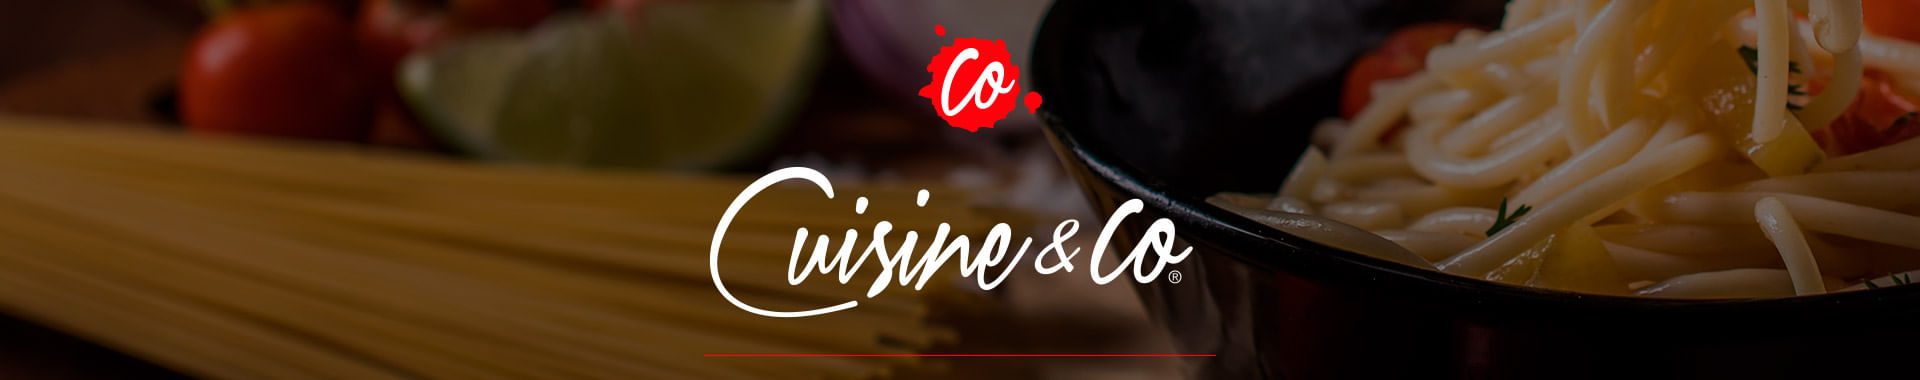 Banner Cuisine Desktop